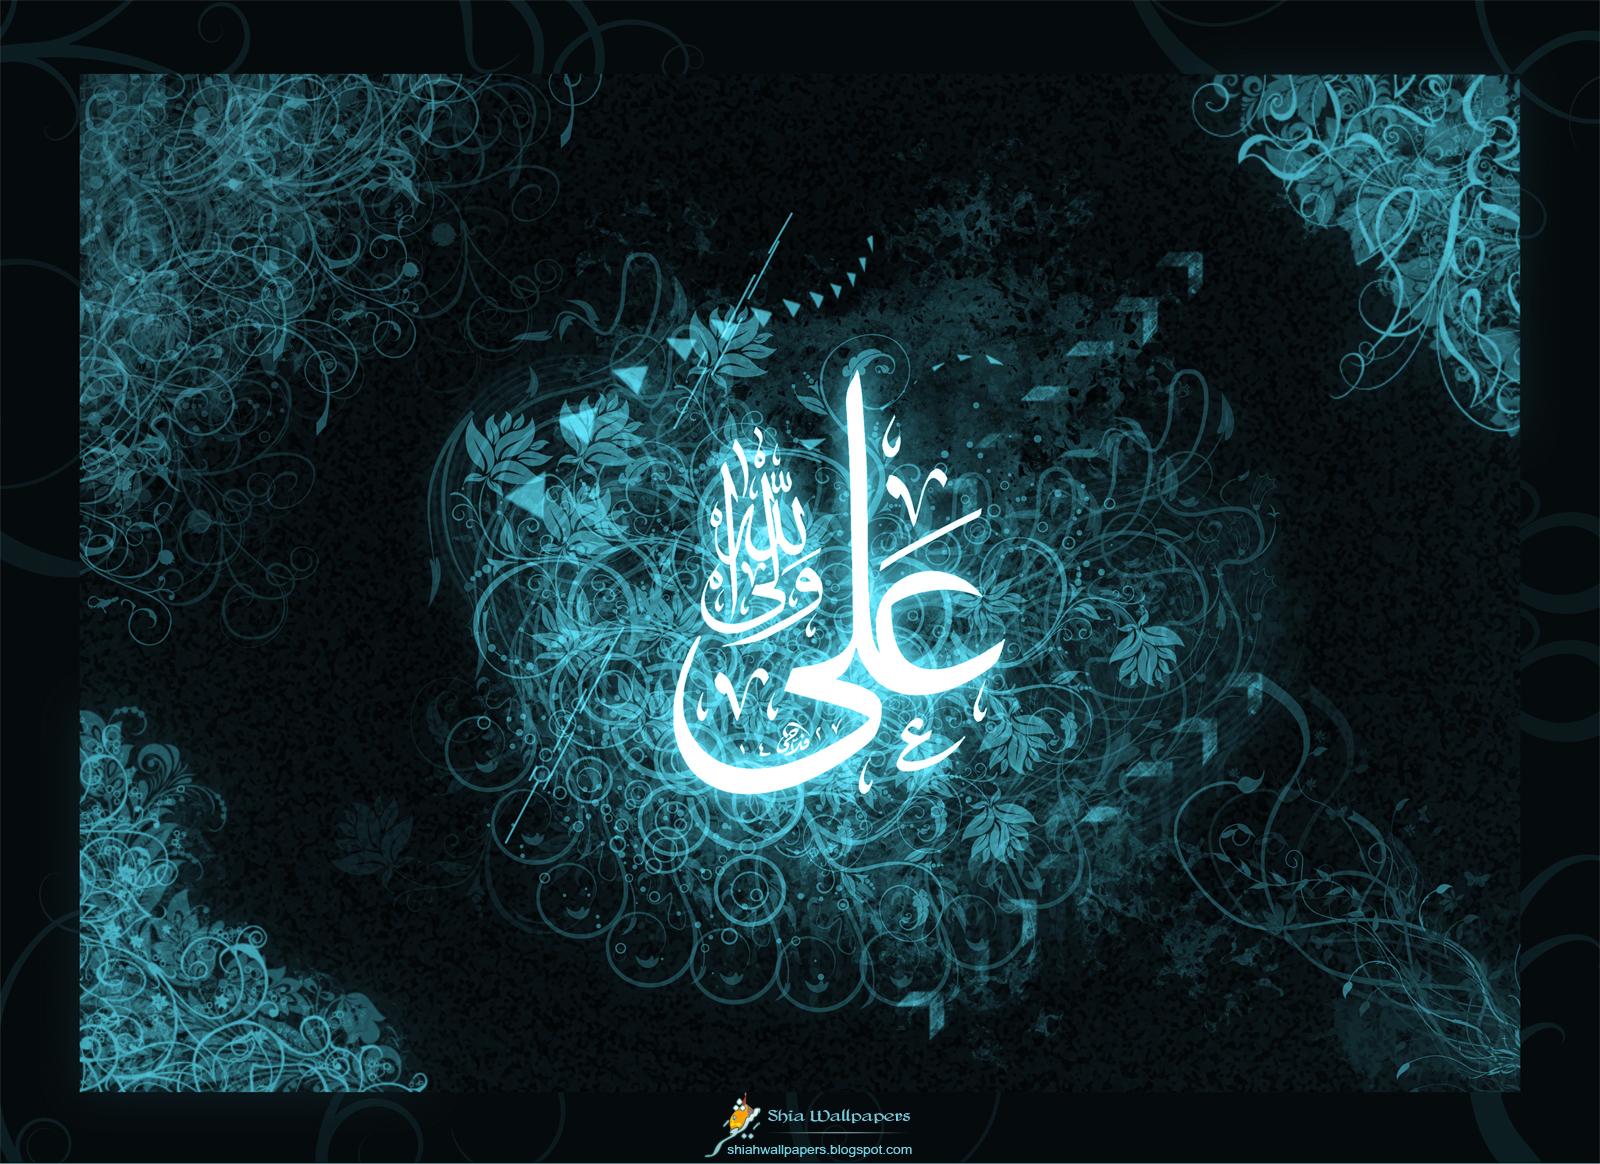 http://2.bp.blogspot.com/_f-aG7DSYngU/TS4KcrnTFqI/AAAAAAAAACI/e1ixucHC0RM/s1600/Ali_as_2b_LR.jpg